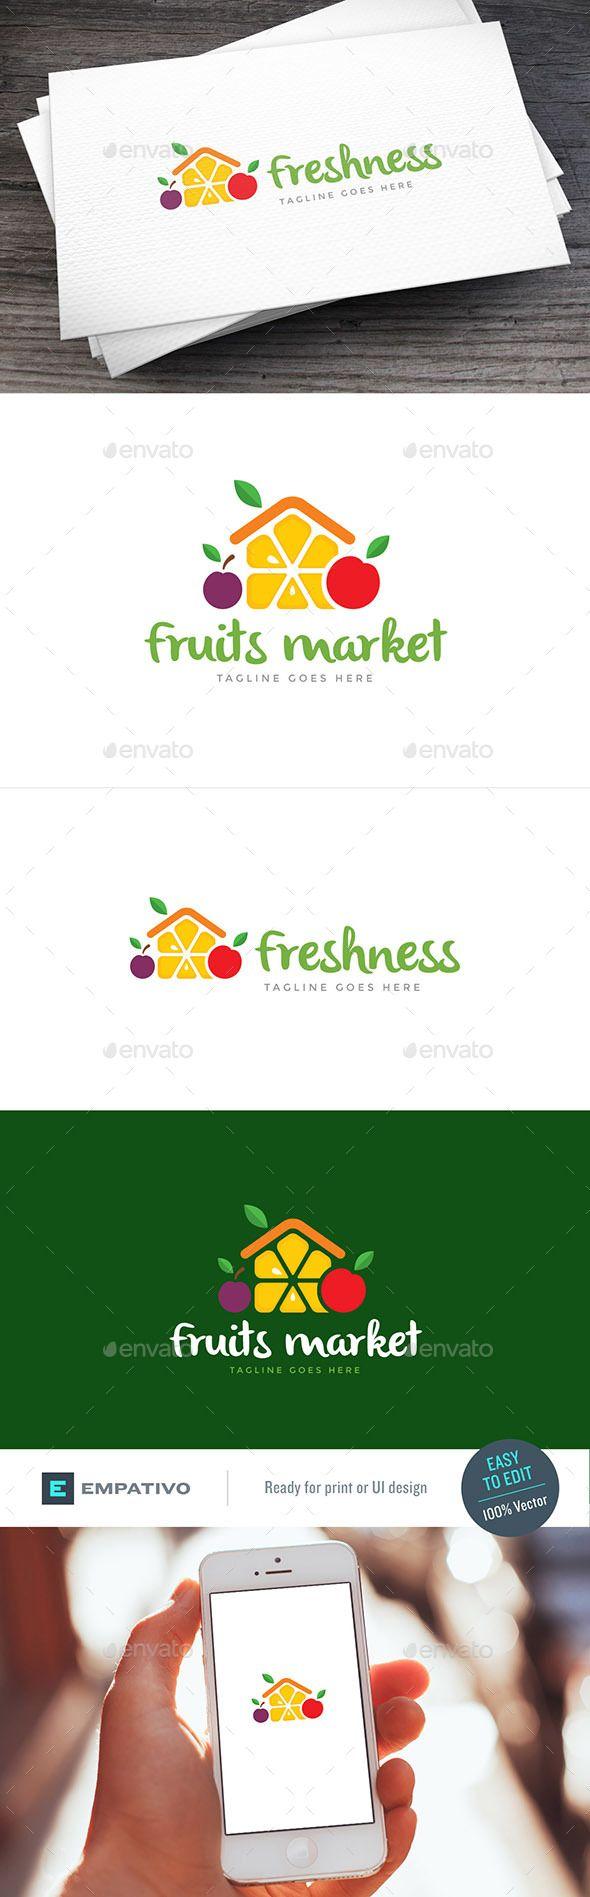 Fruits Market Logo Template Vector EPS, AI Illustrator